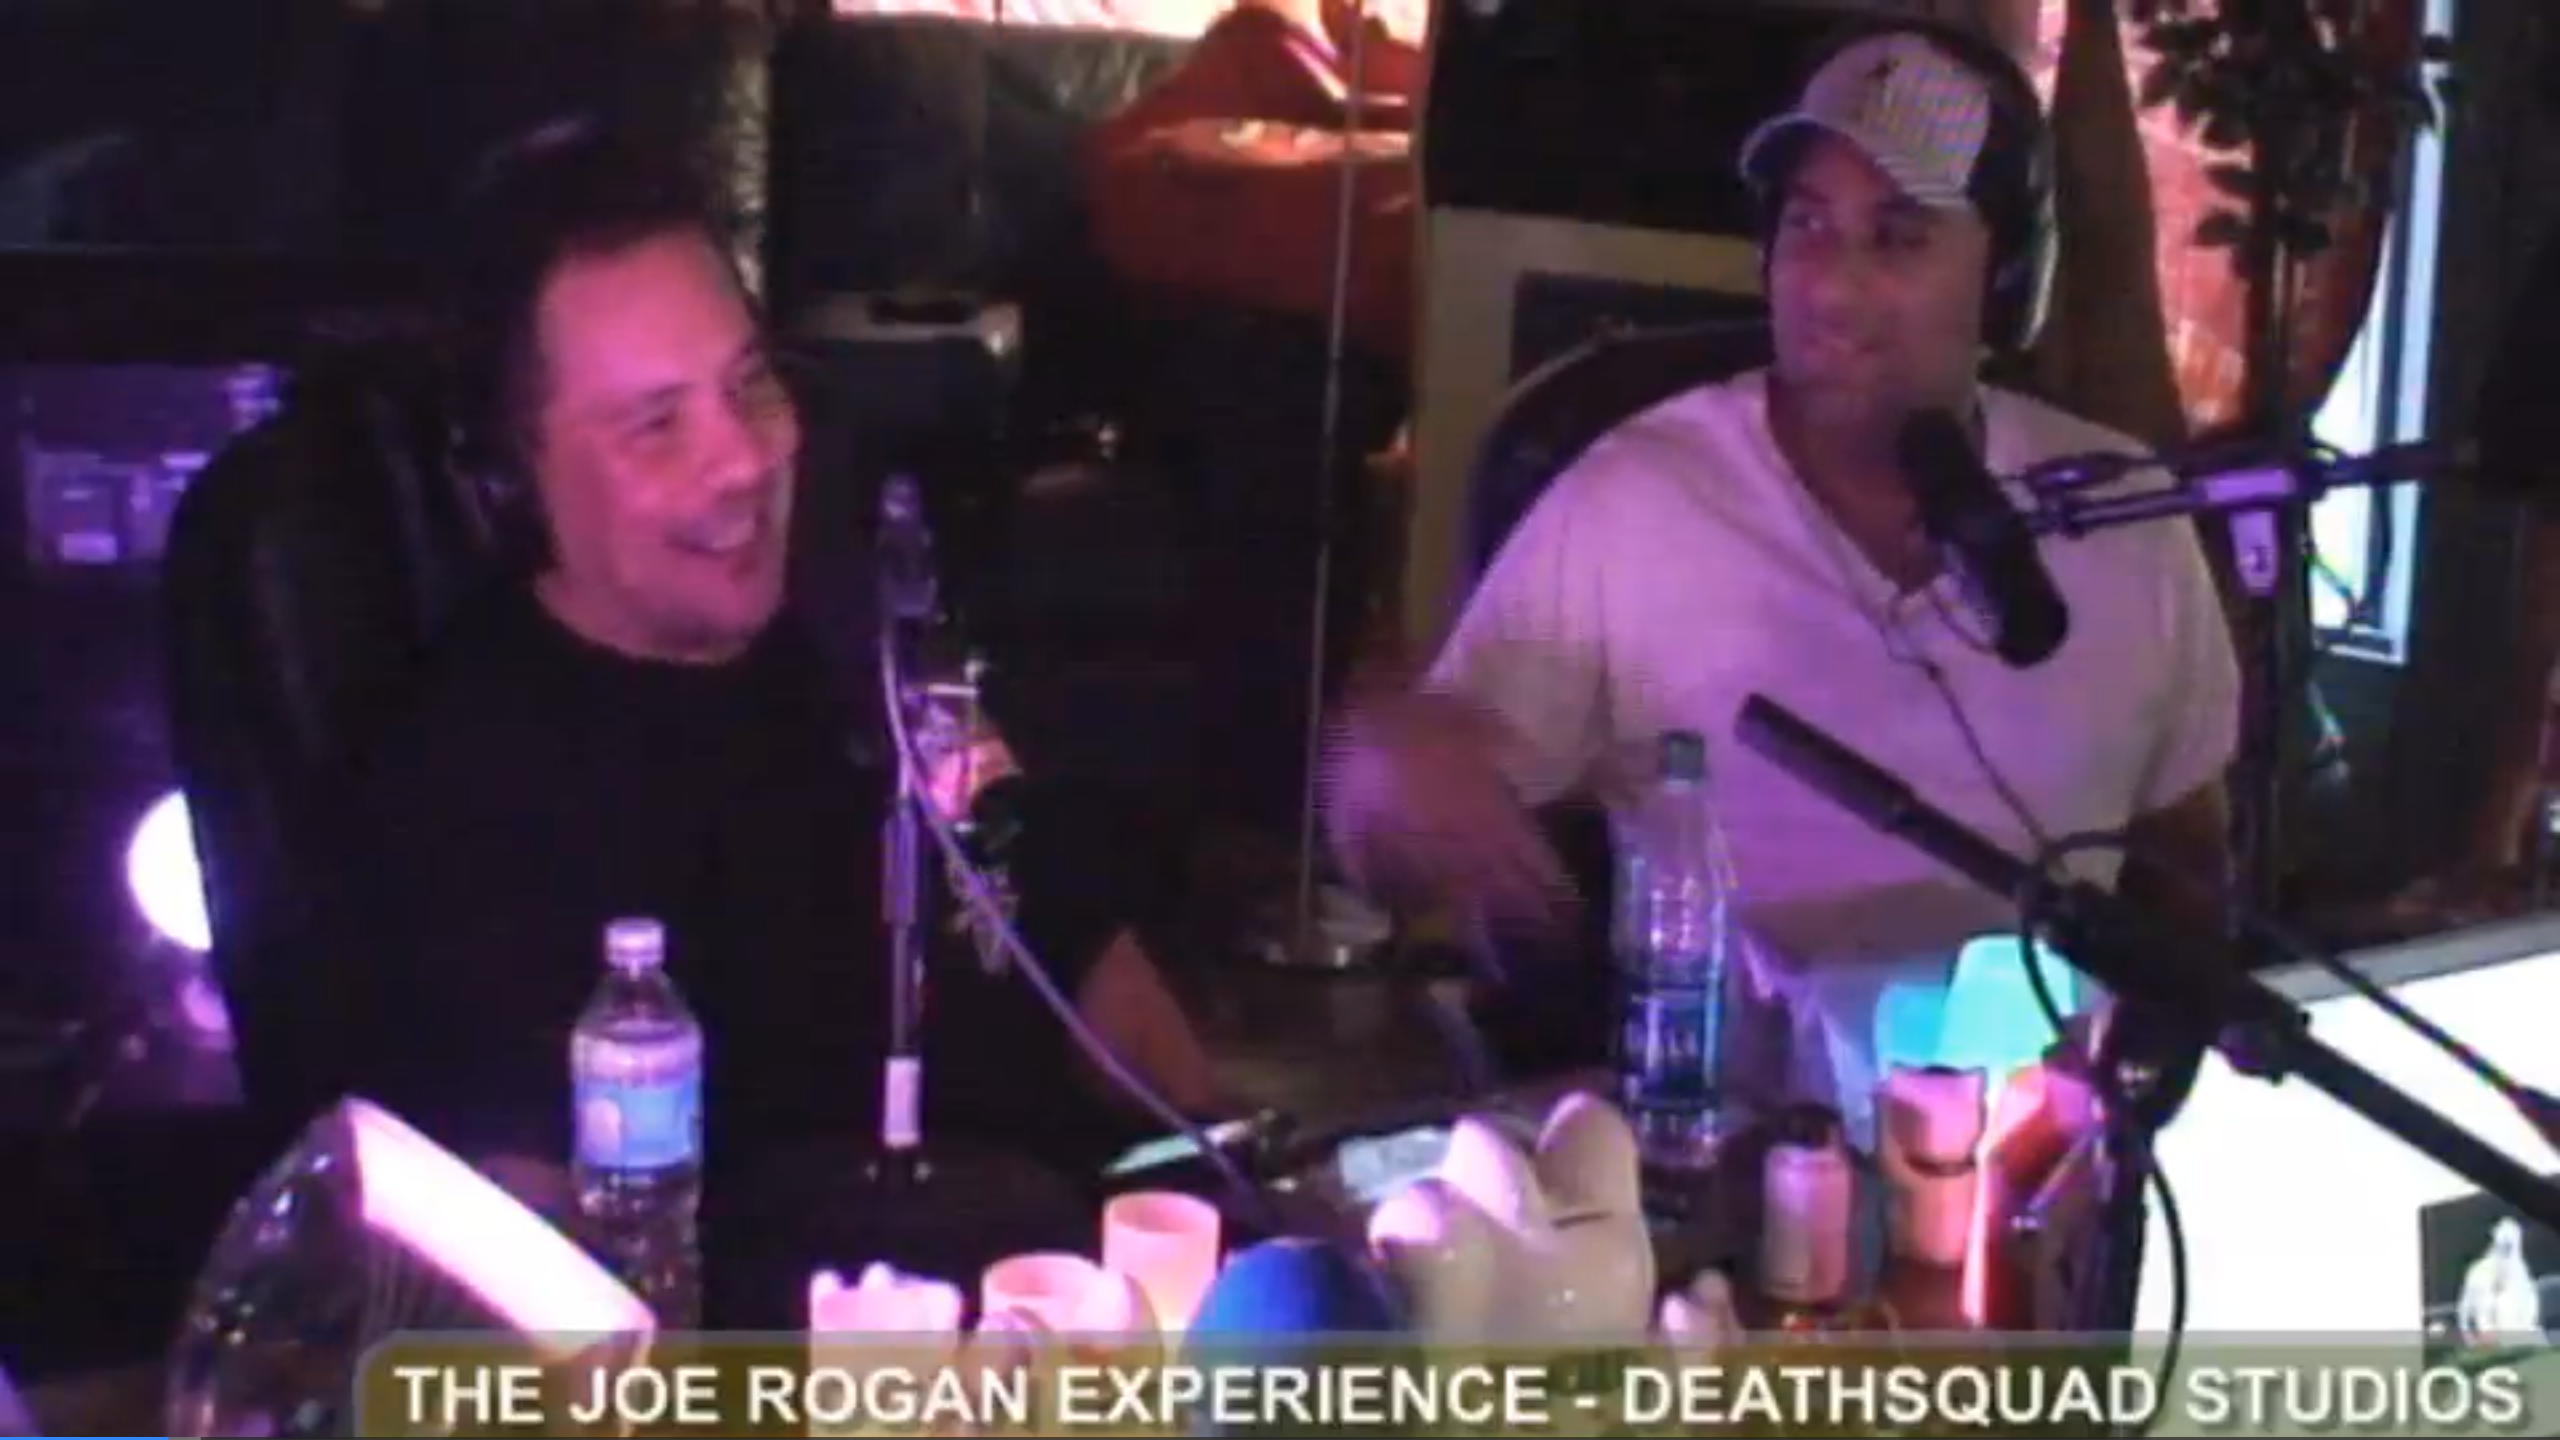 The Joe Rogan Experience #296 - Mix Master Mike, Russell Peters, Mark Rasta, Brian Redban